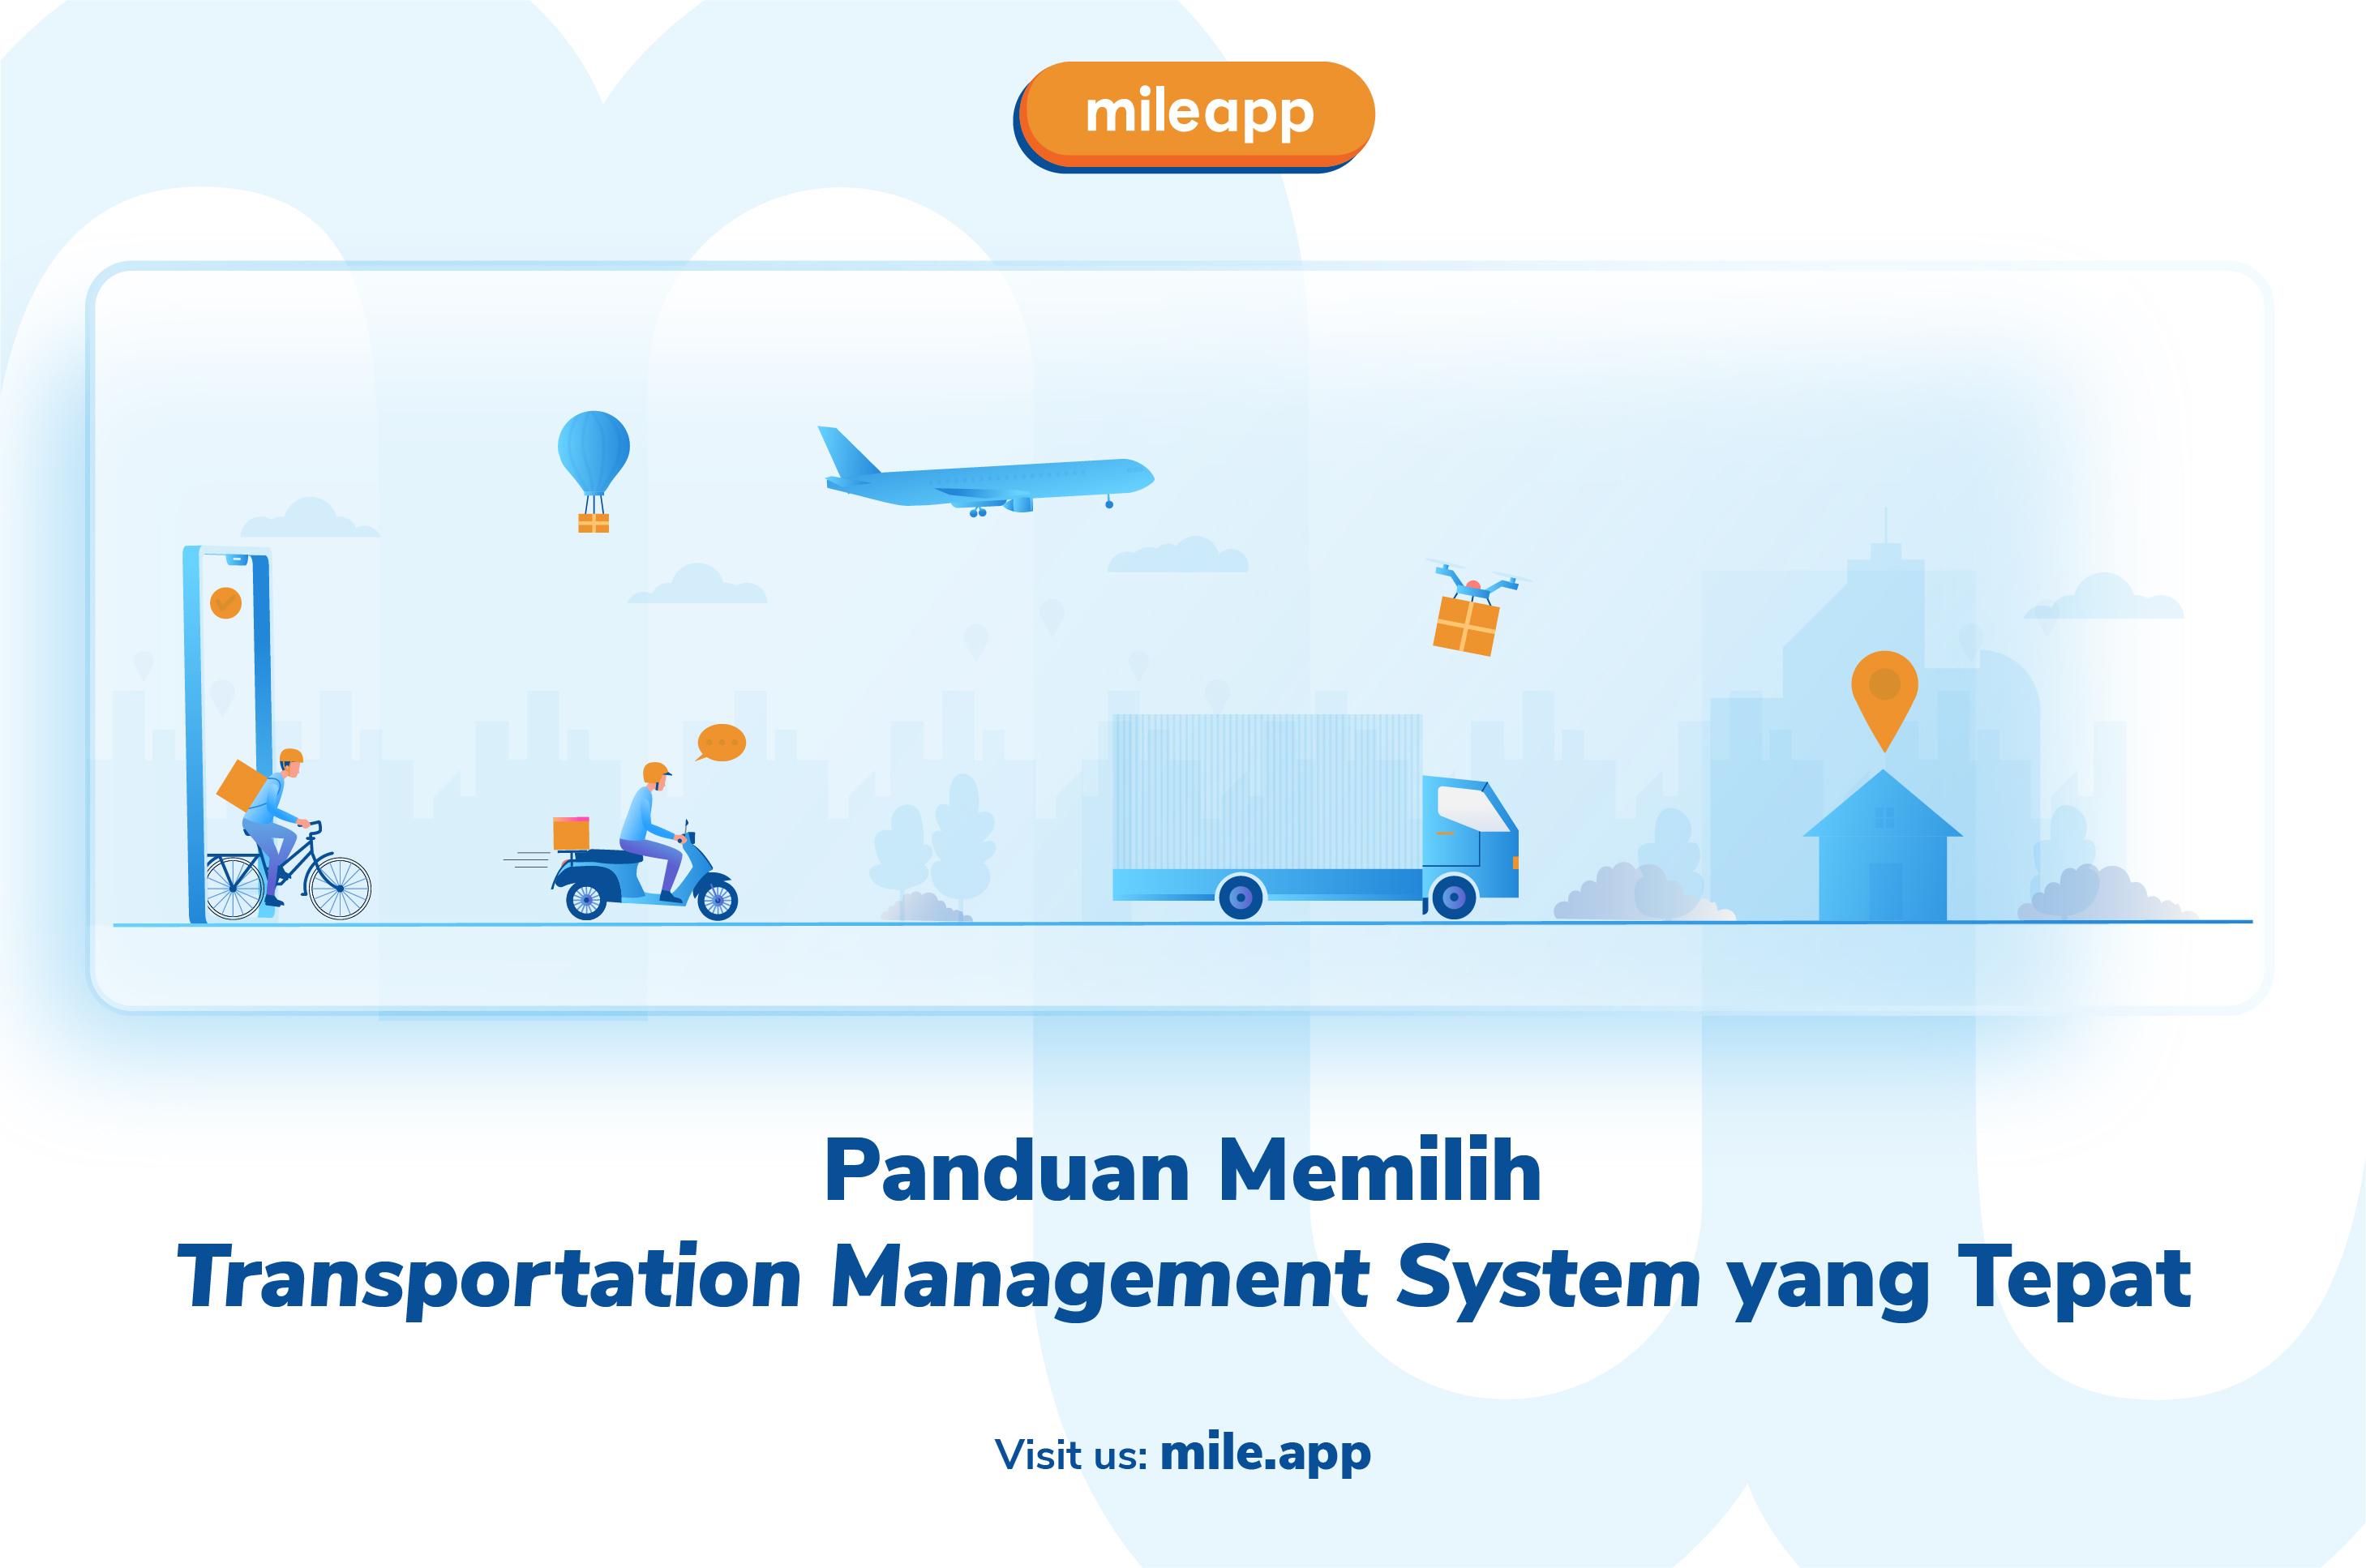 Panduan Transportation Management System